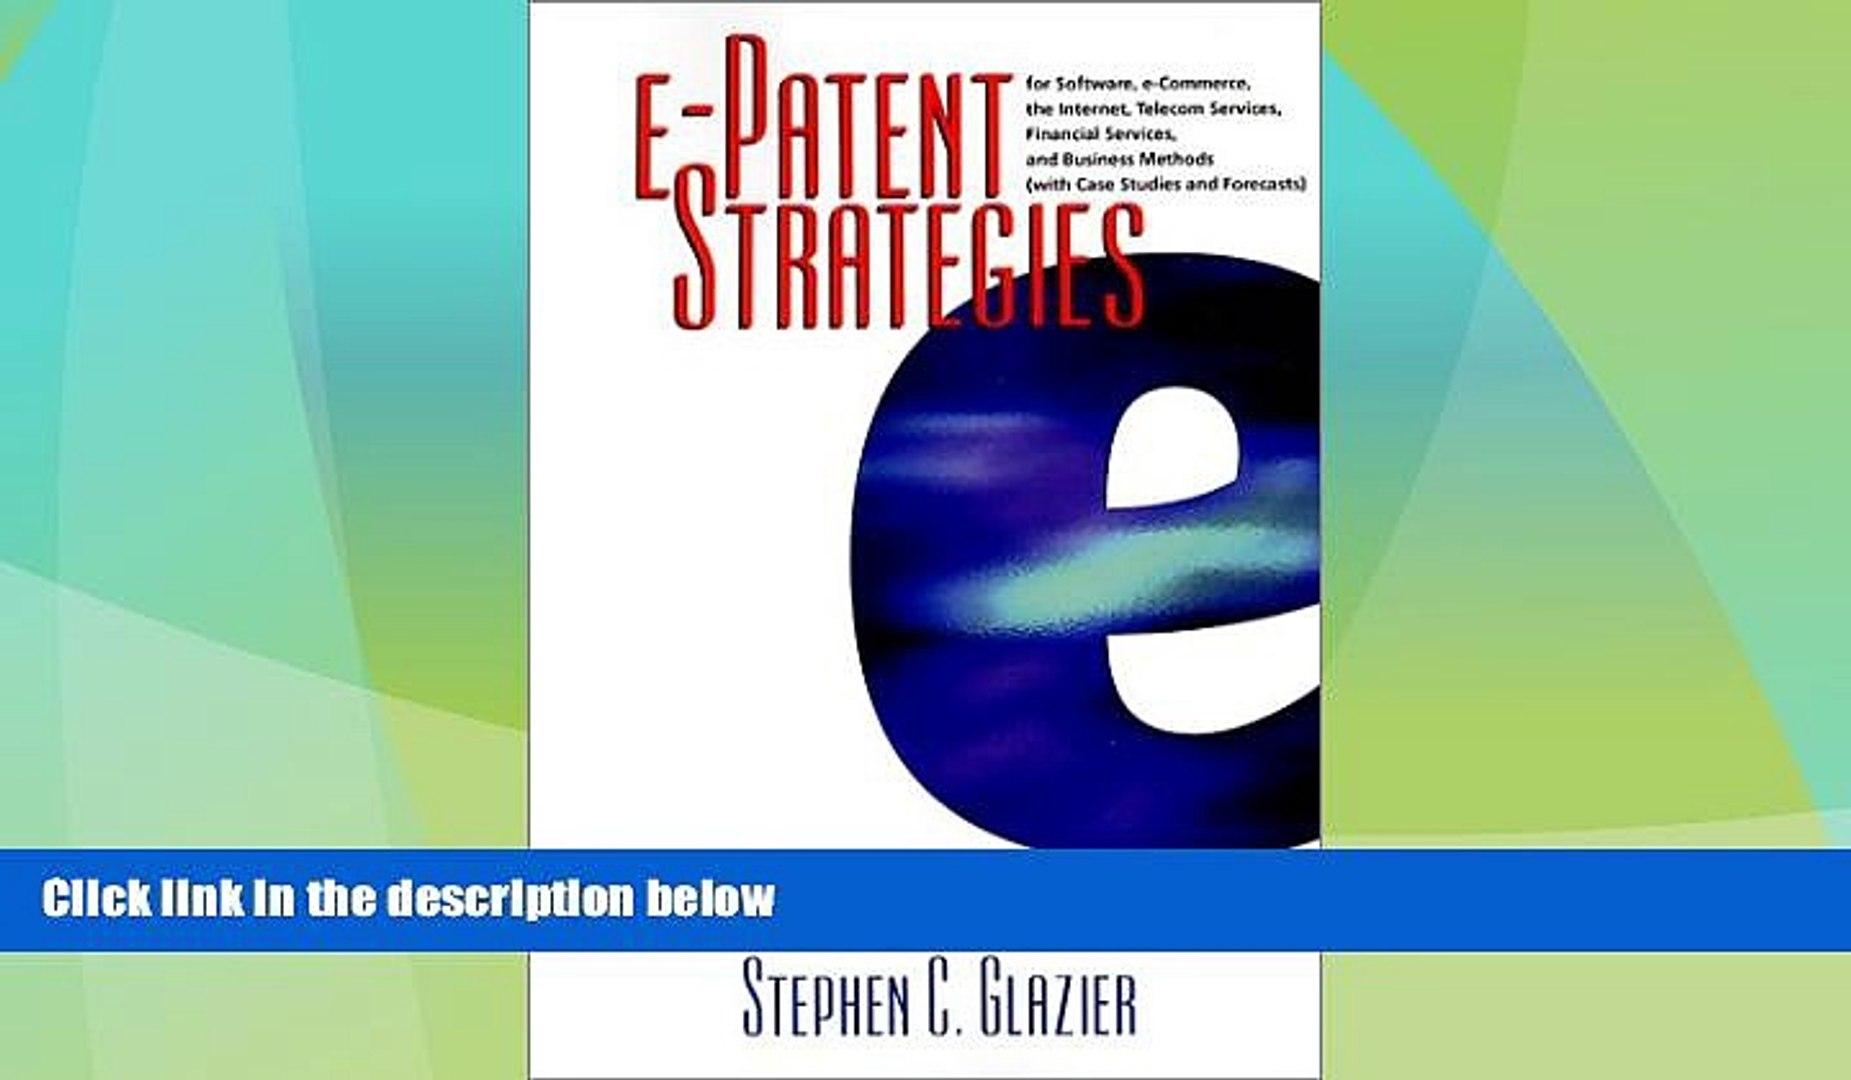 Big Deals  e-Patent Strategies for Software, e-Commerce, the Internet, Telecom Services, Financial